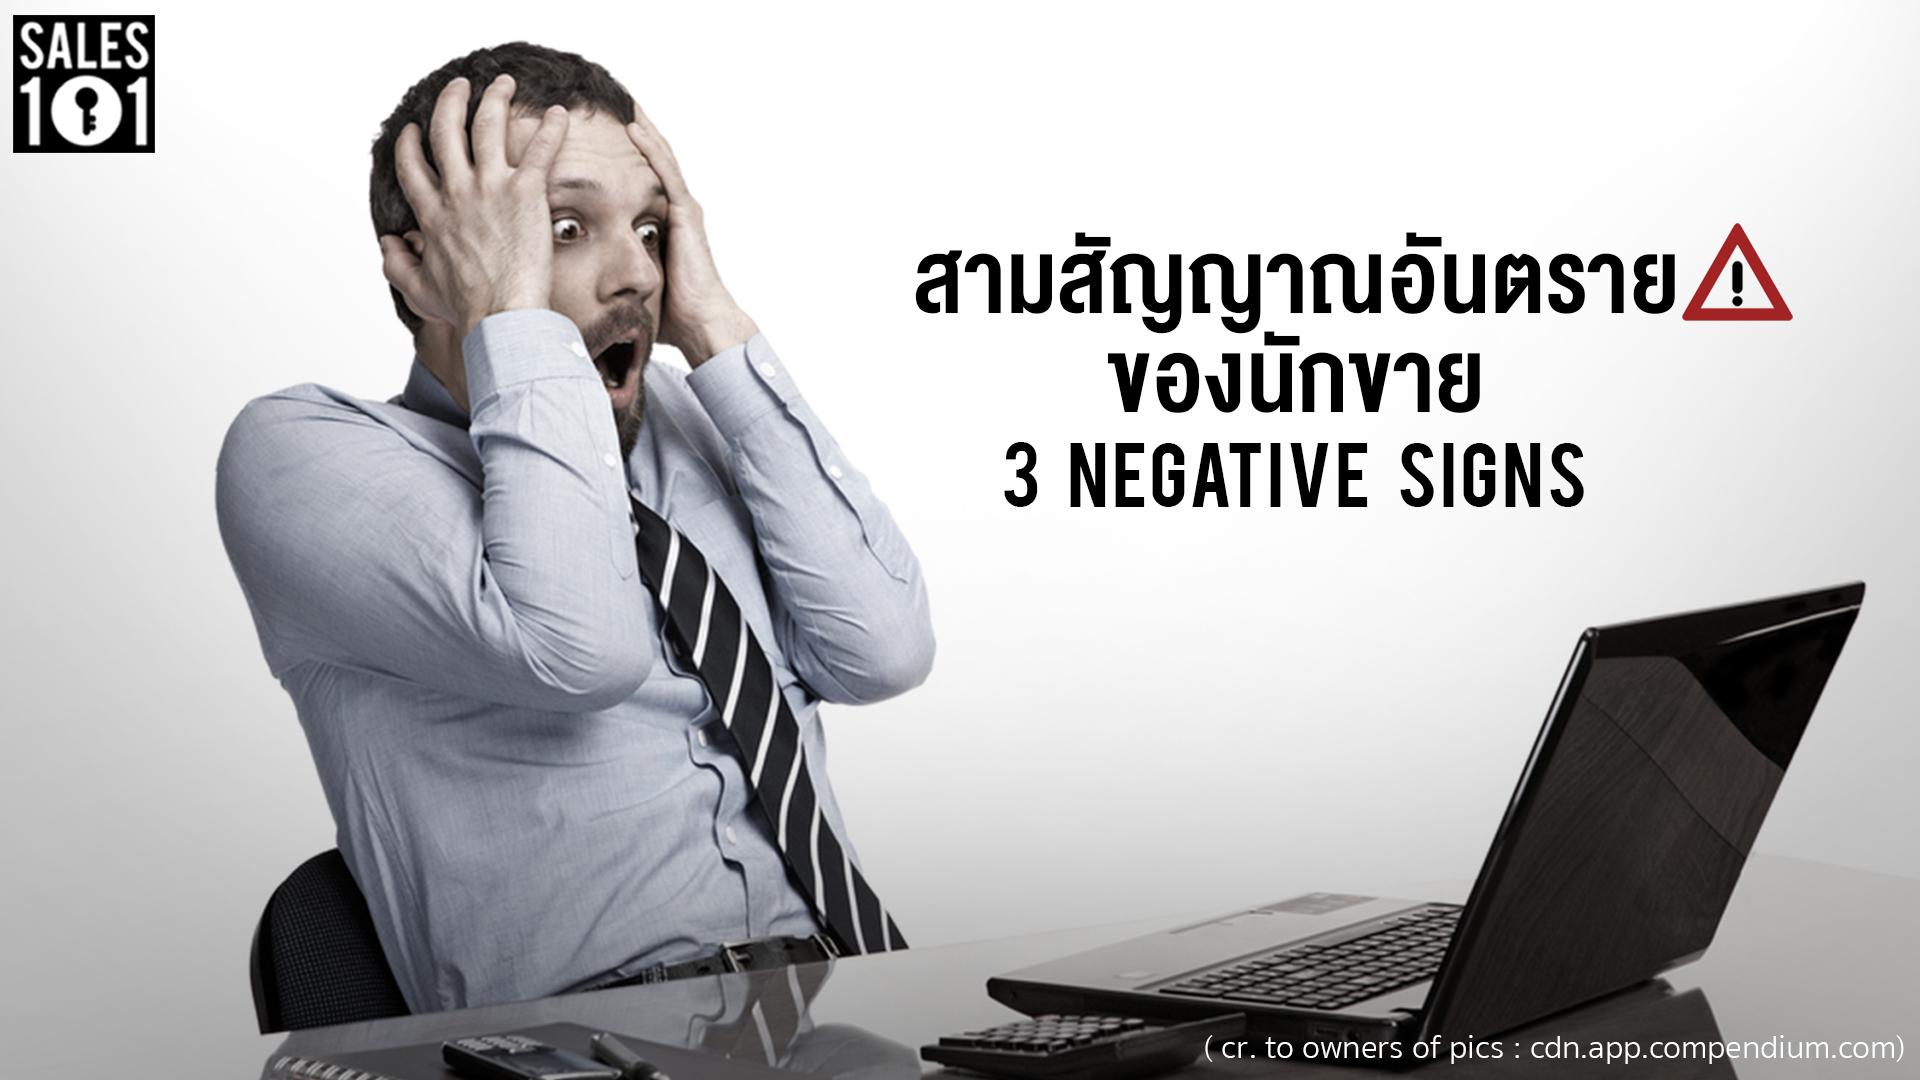 3 Negative Signs